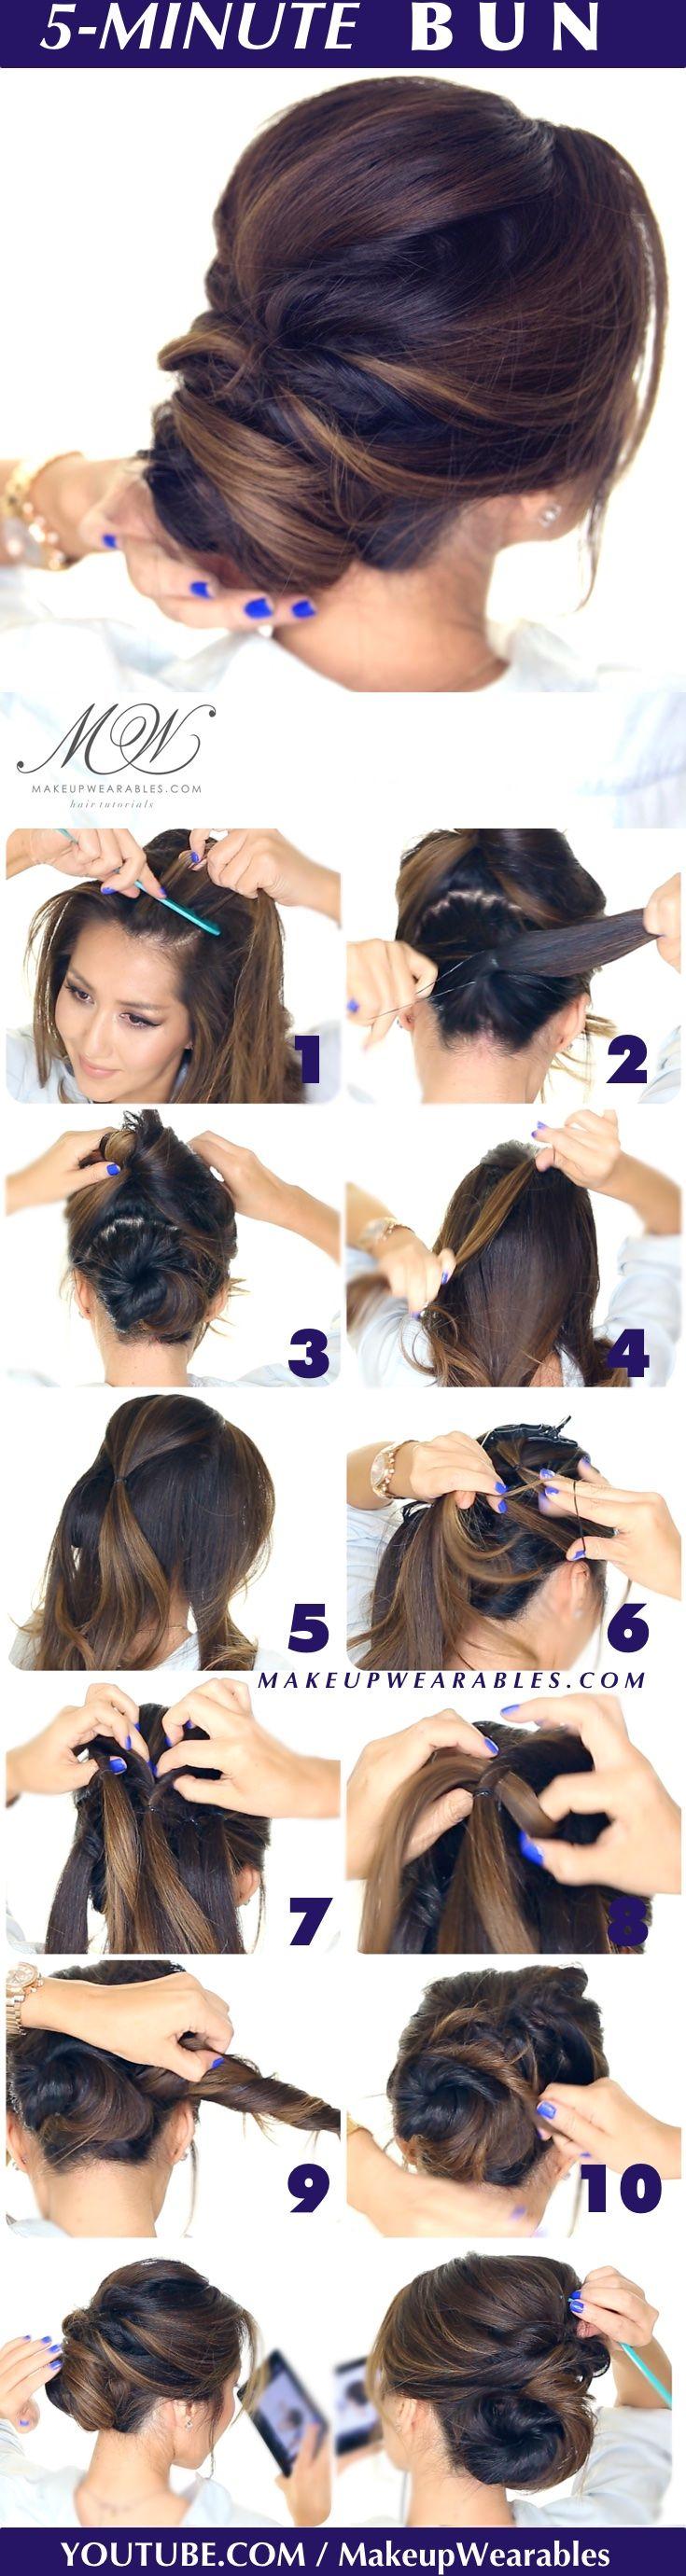 Sensational Buns Elegant Bun And Bun Hairstyles On Pinterest Short Hairstyles Gunalazisus